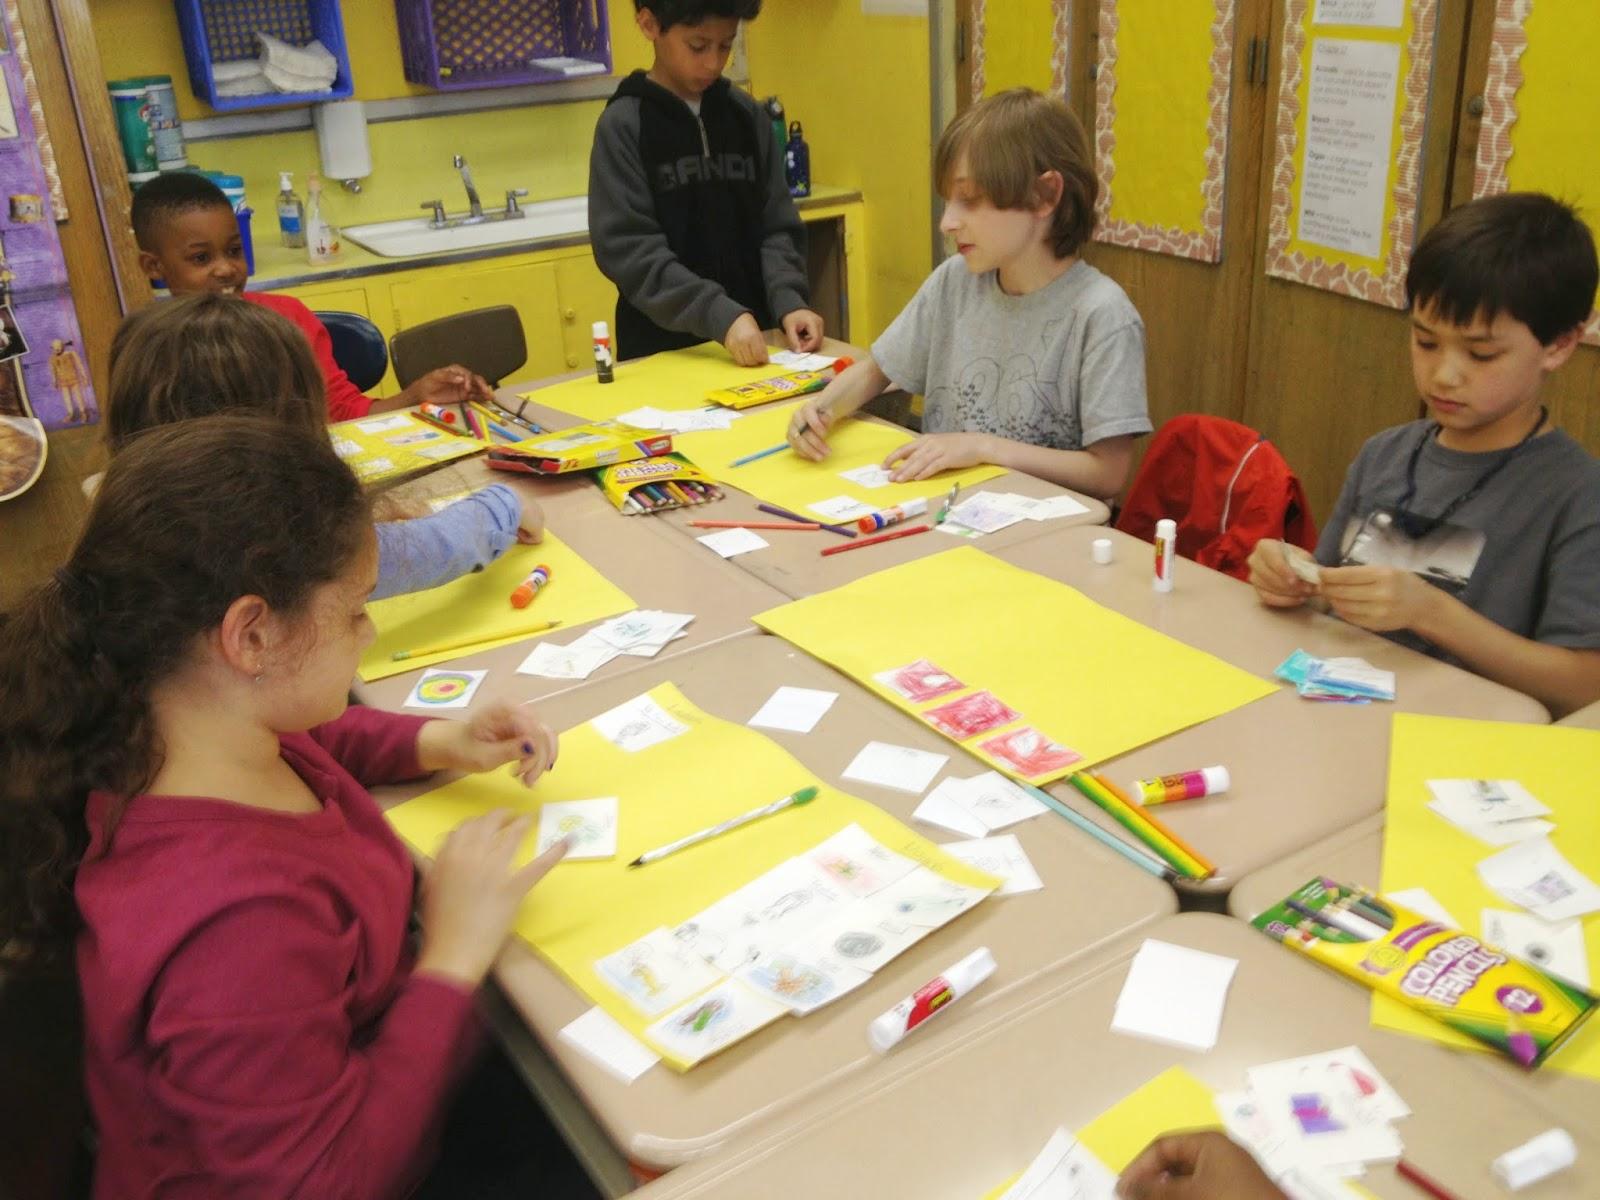 steach4fun teacher and parent resources communication cards